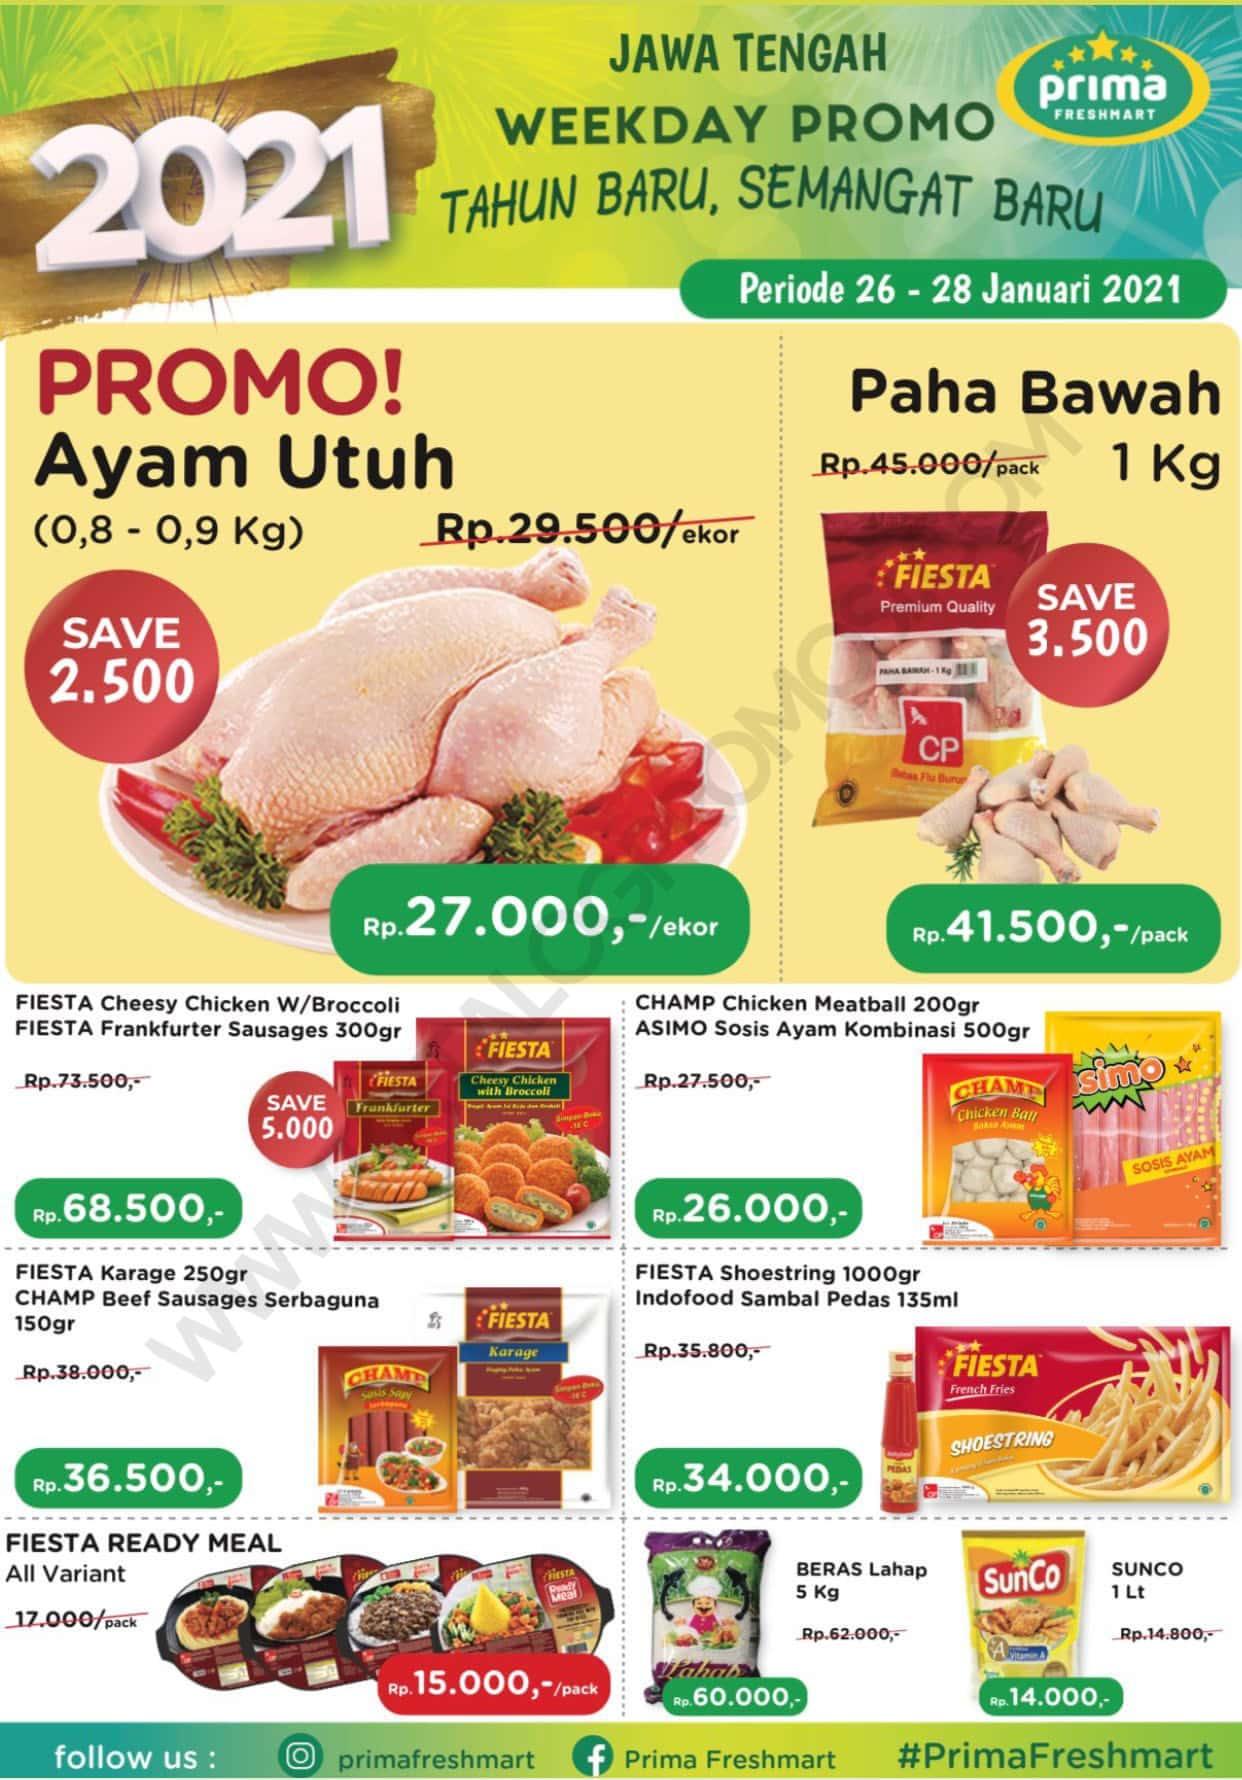 Promo Prima Freshmart Terbaru - Katalog Belanja Weekday periode 26-28 Januari 2021